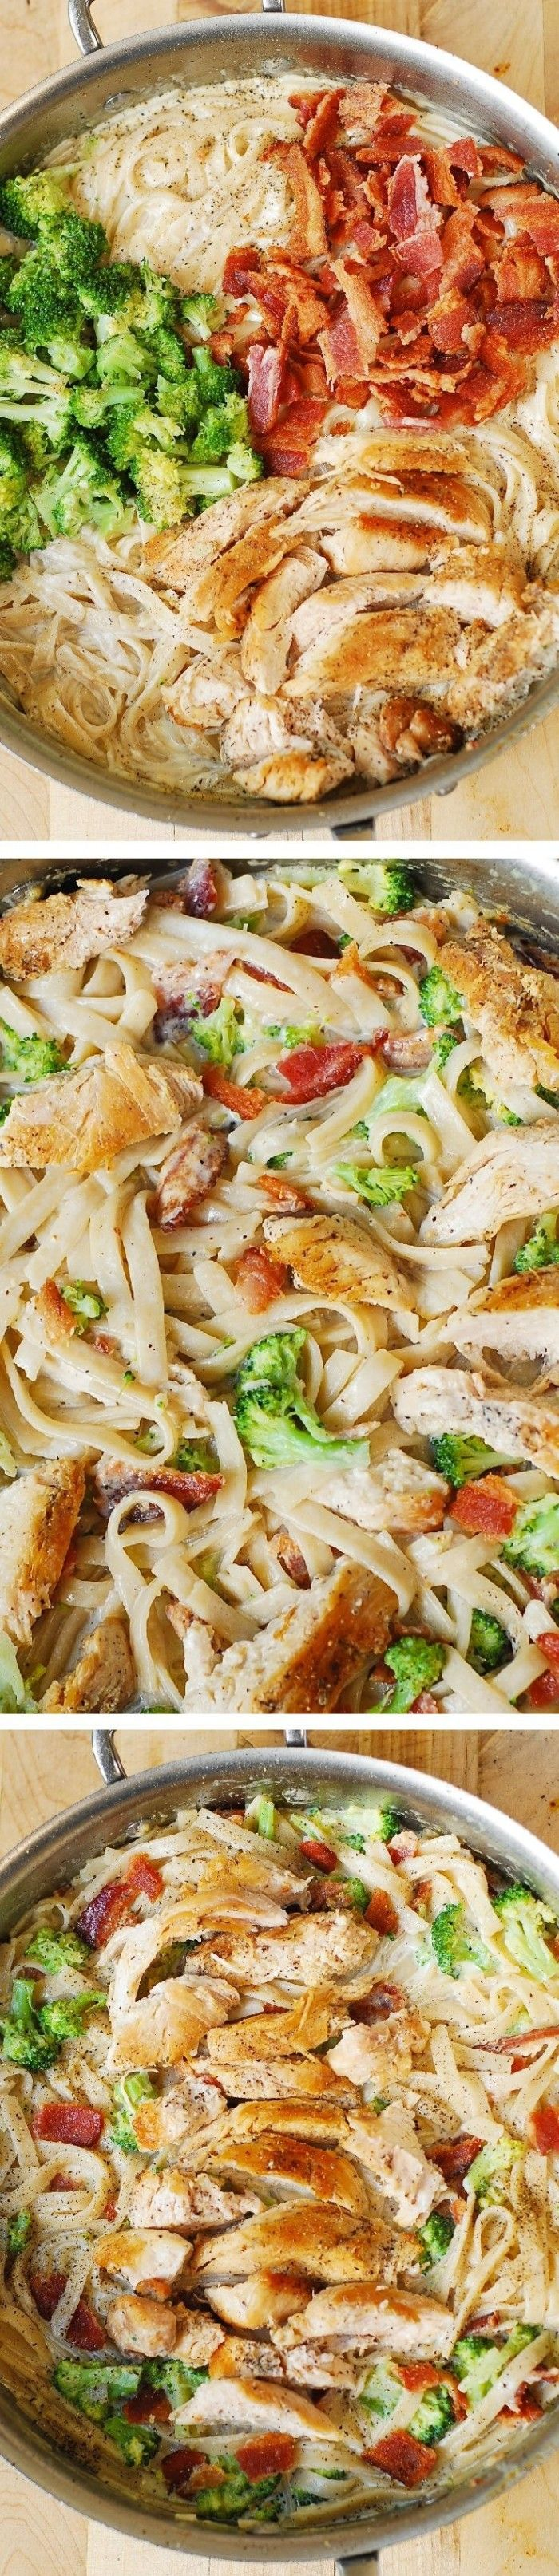 Creamy Broccoli, Chicken, and Bacon Pasta | Tastefulonly